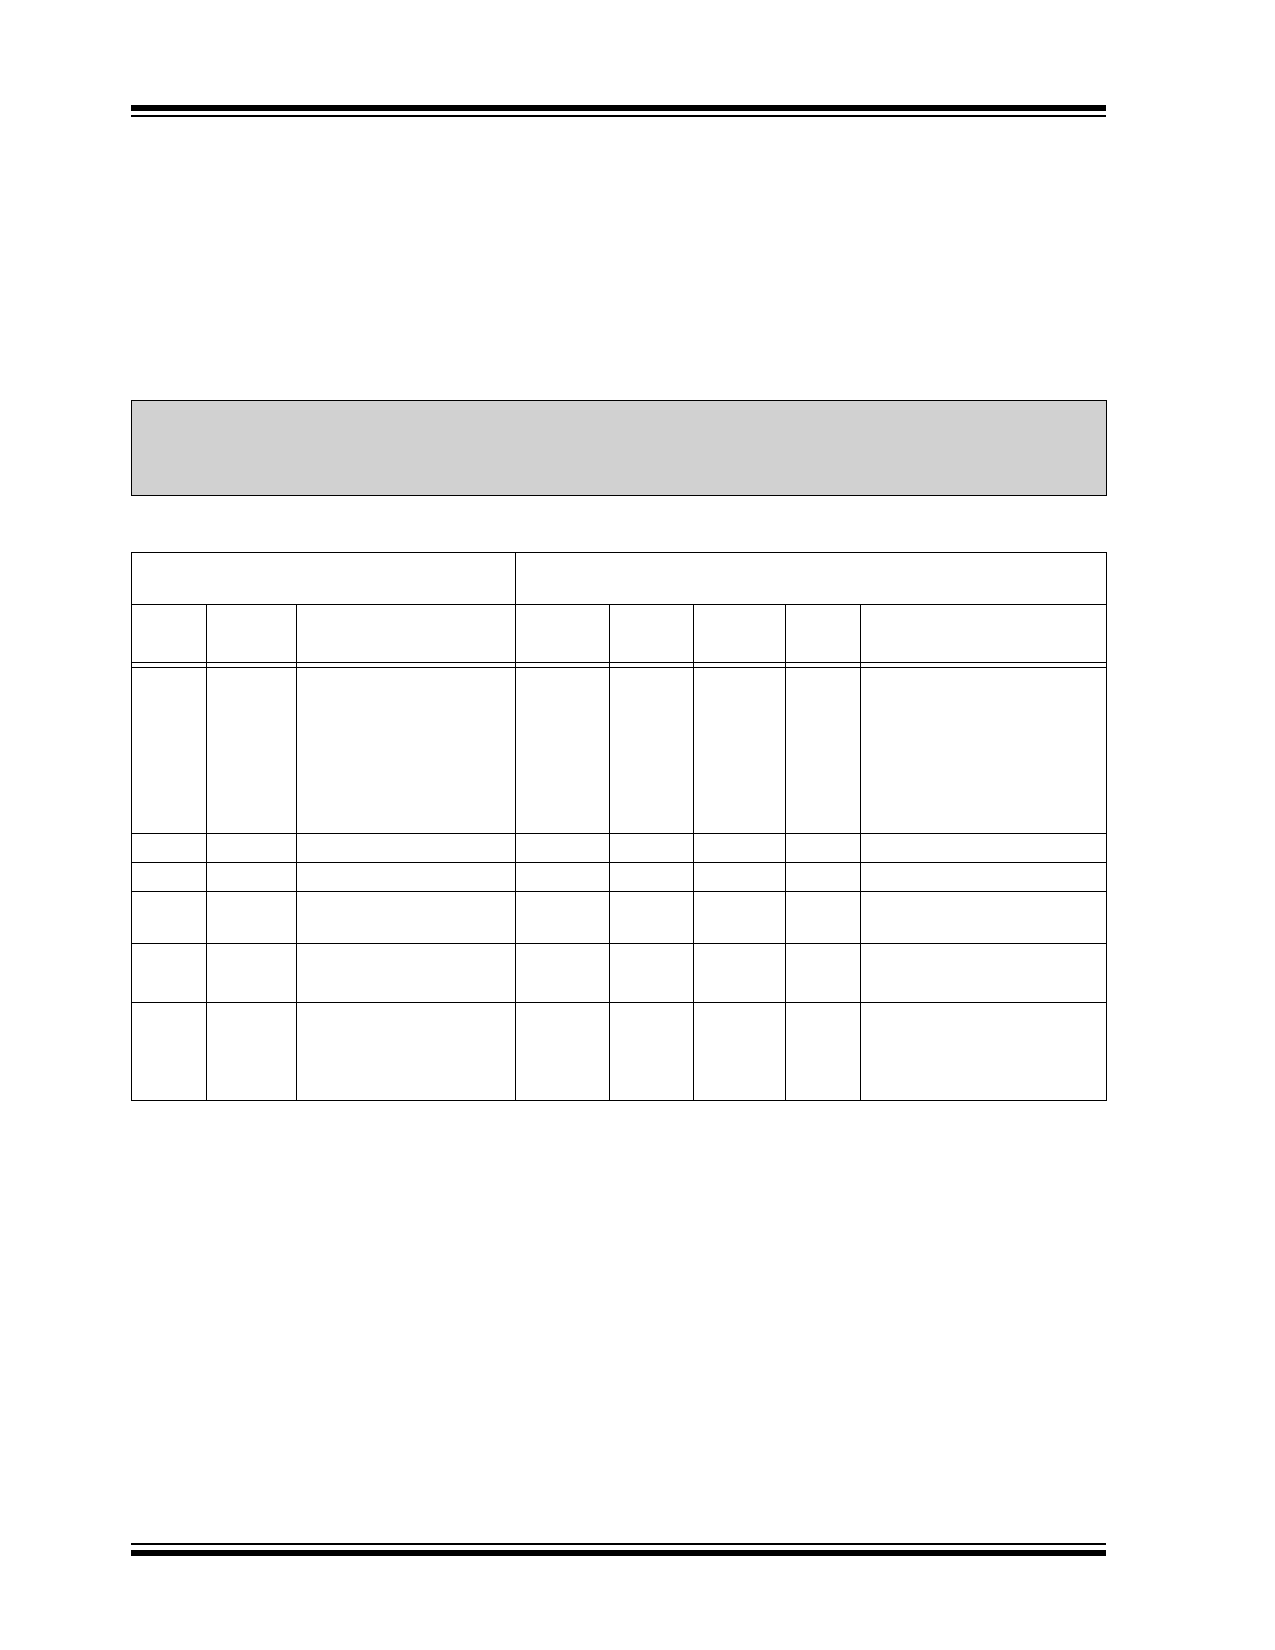 24LC02B pdf, schematic